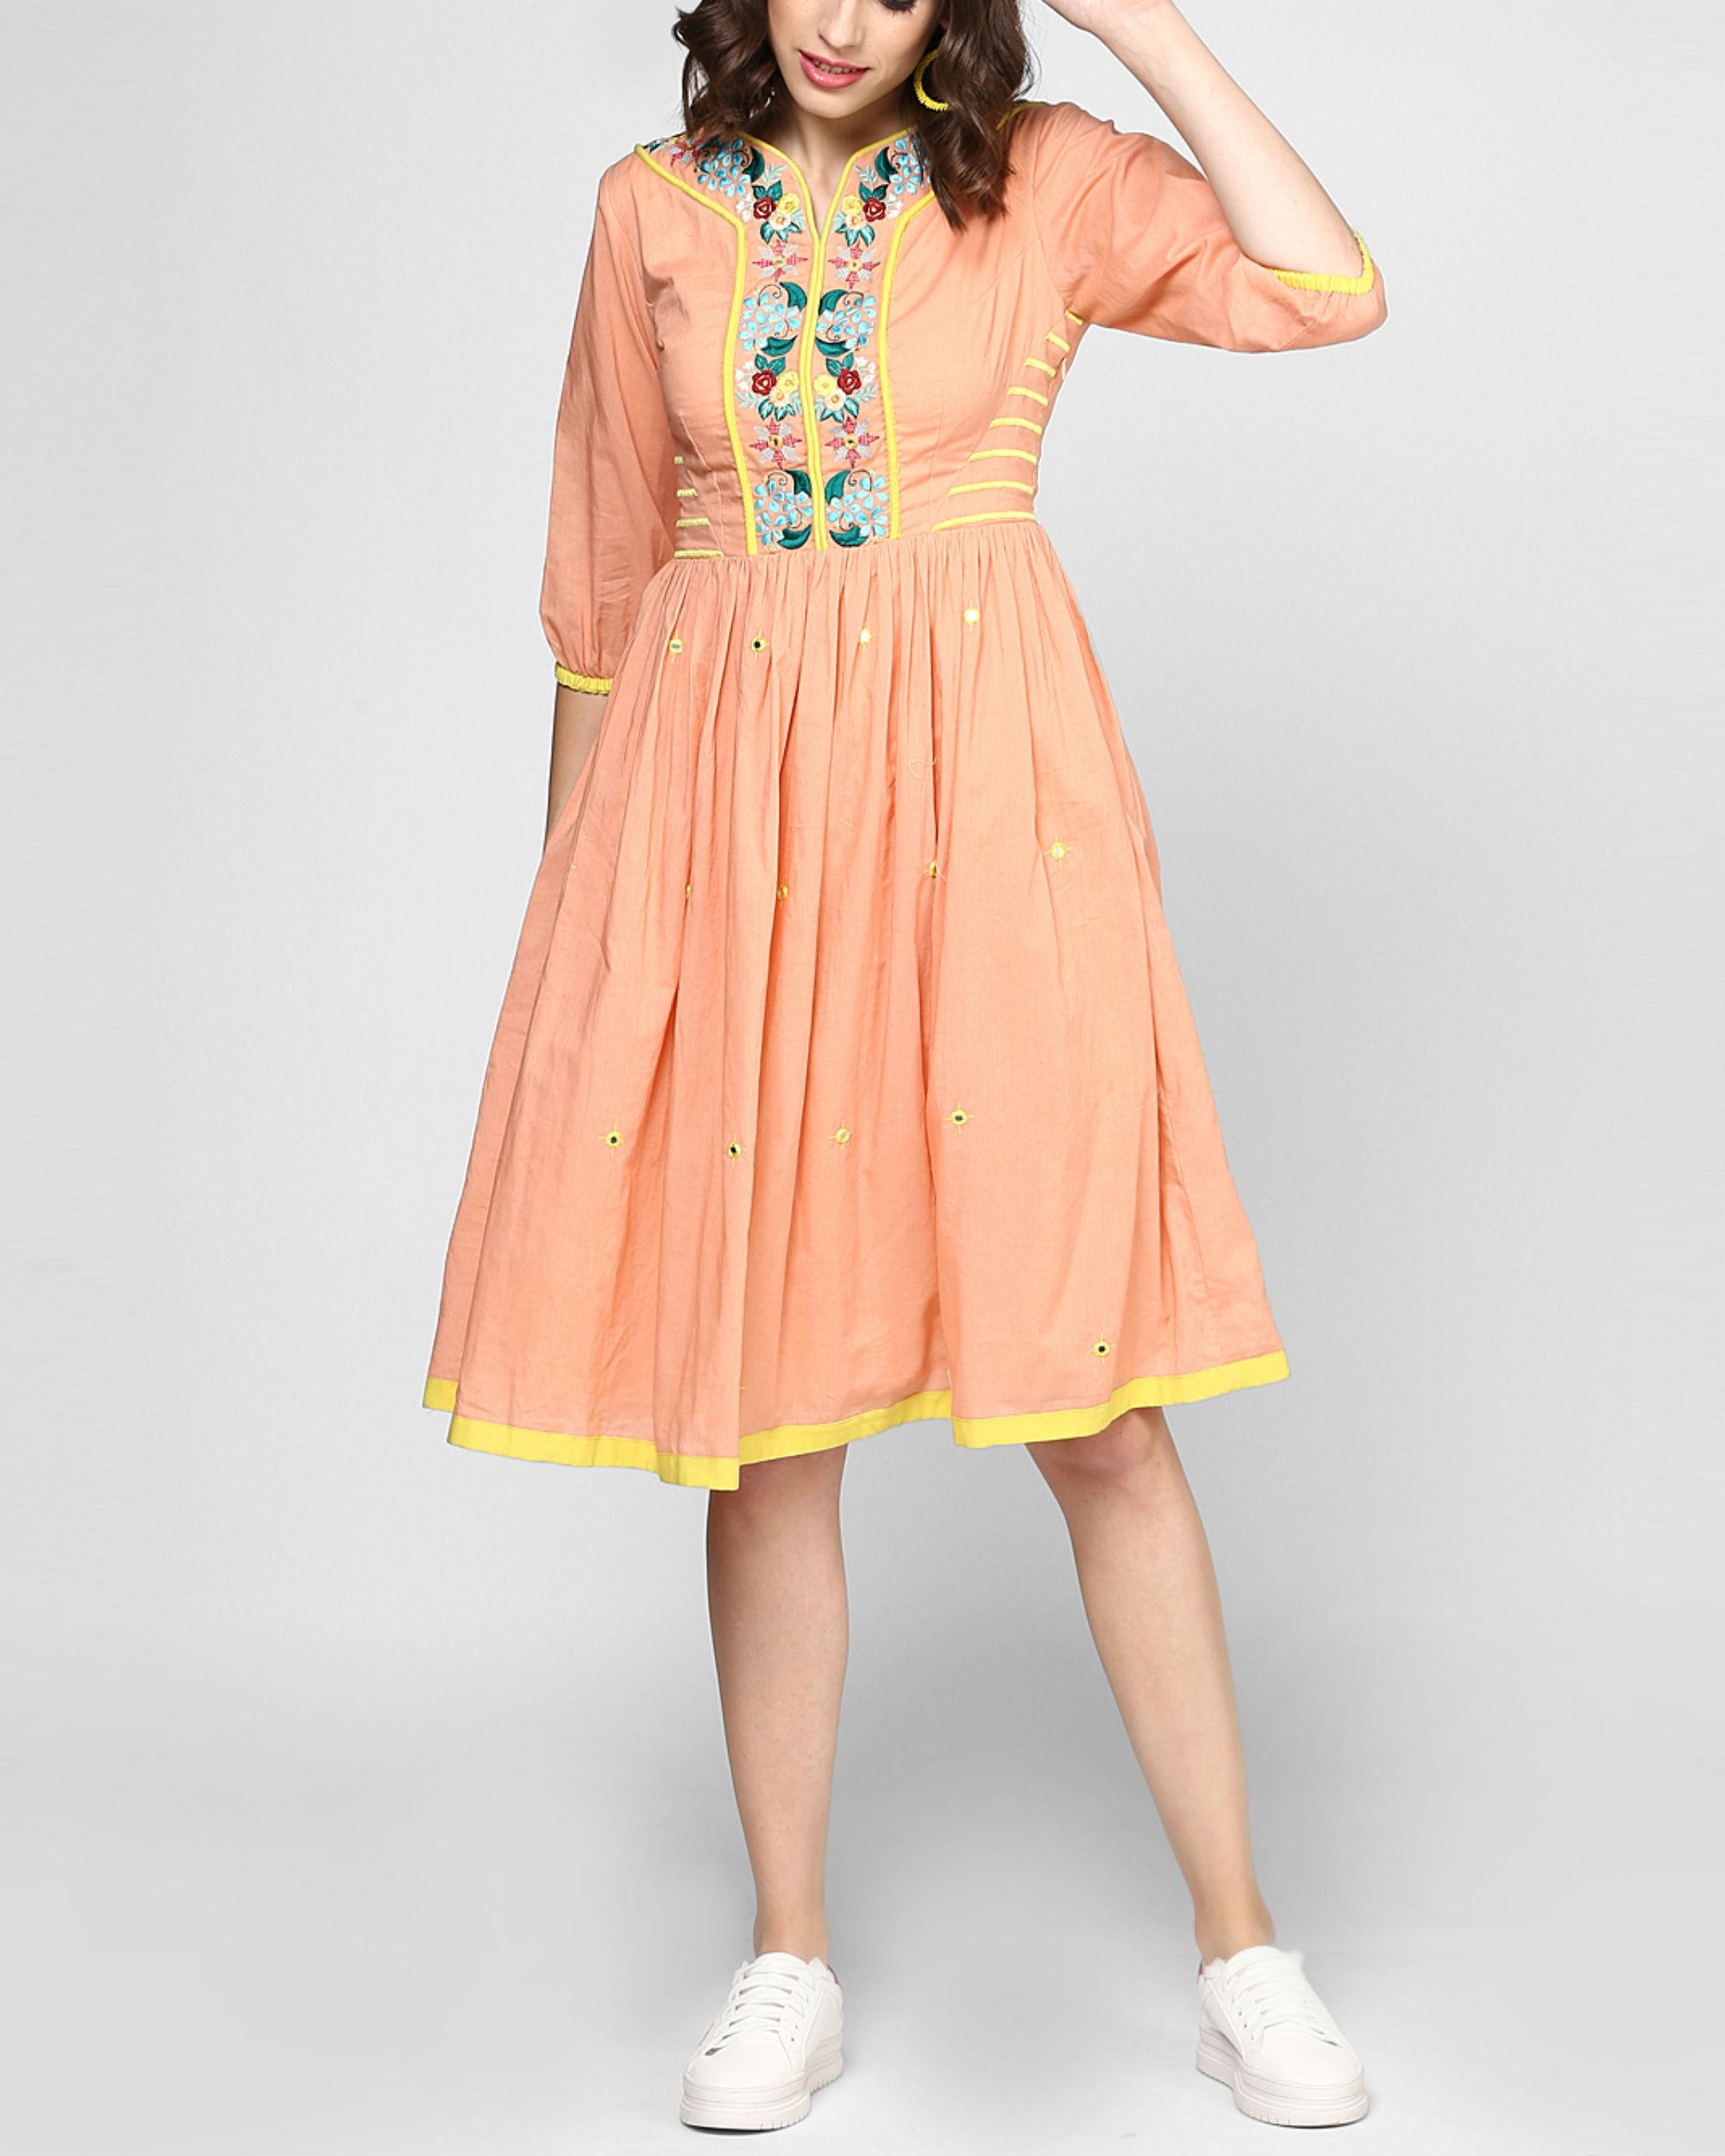 Peach embroidered midi dress